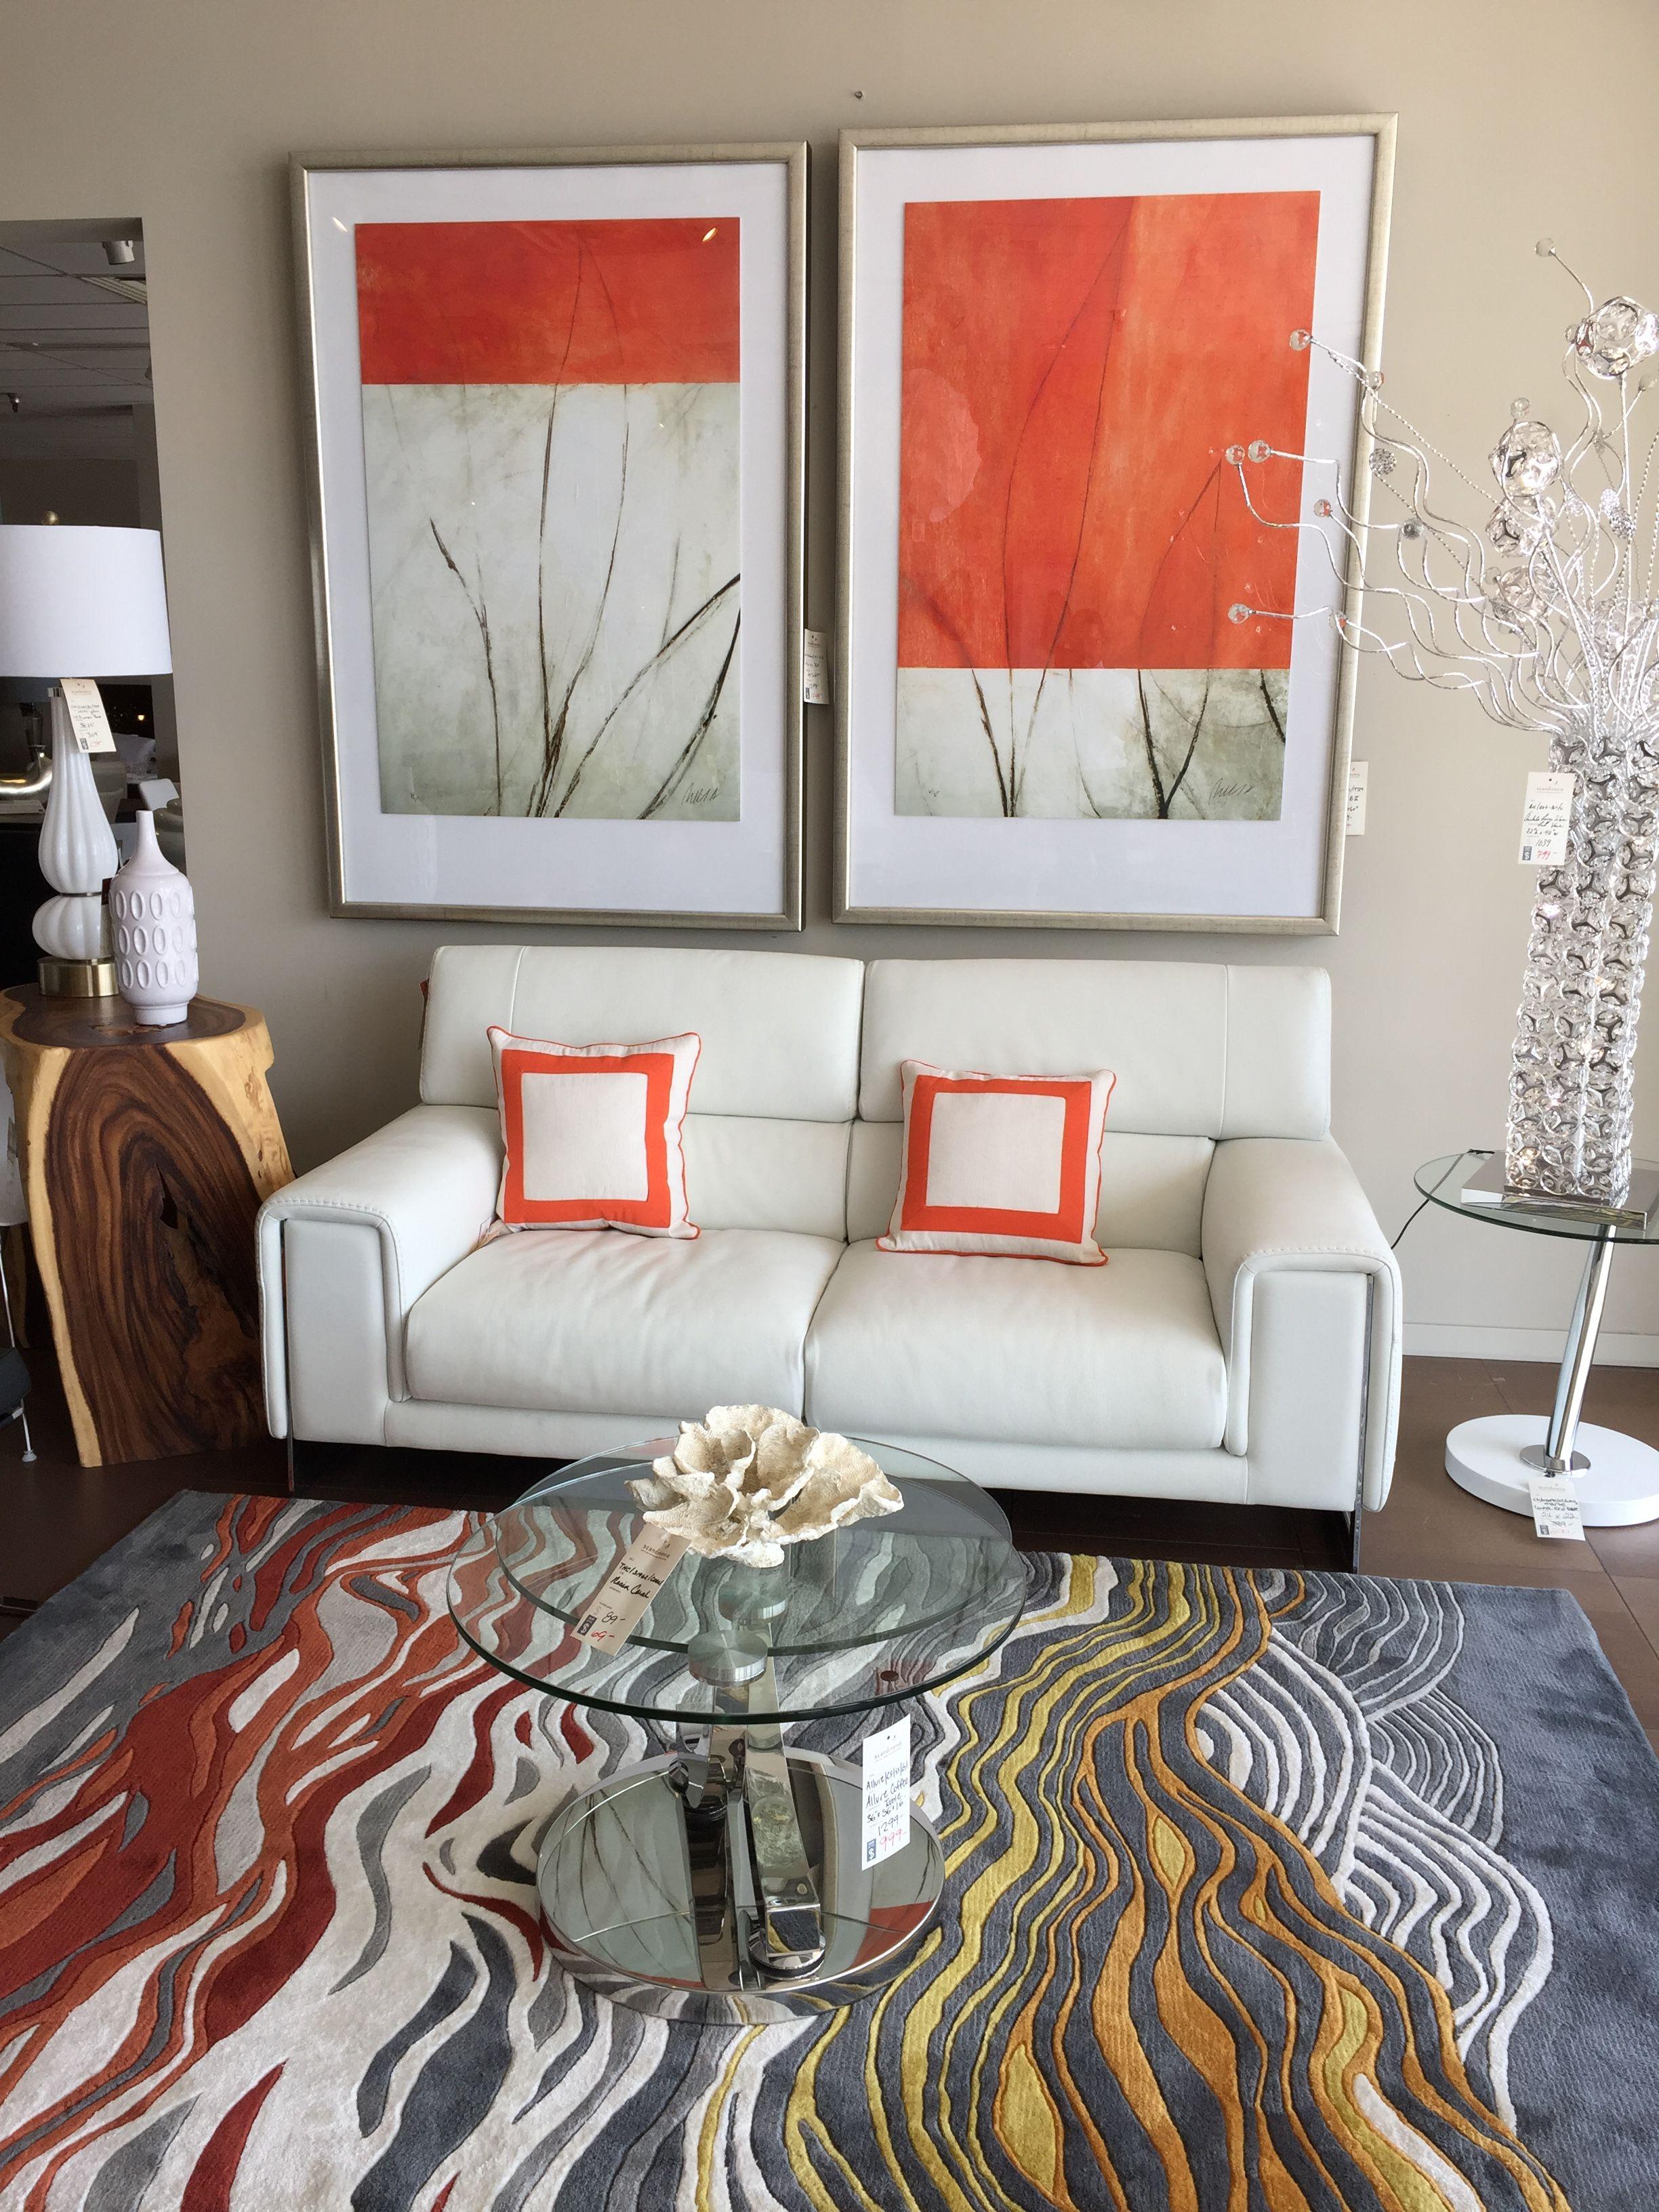 Etolie Natuzzi Sofa Living Room Leather Scandinavia Inc Metairie New Orleans Louisiana Contemporary Modern Furniture